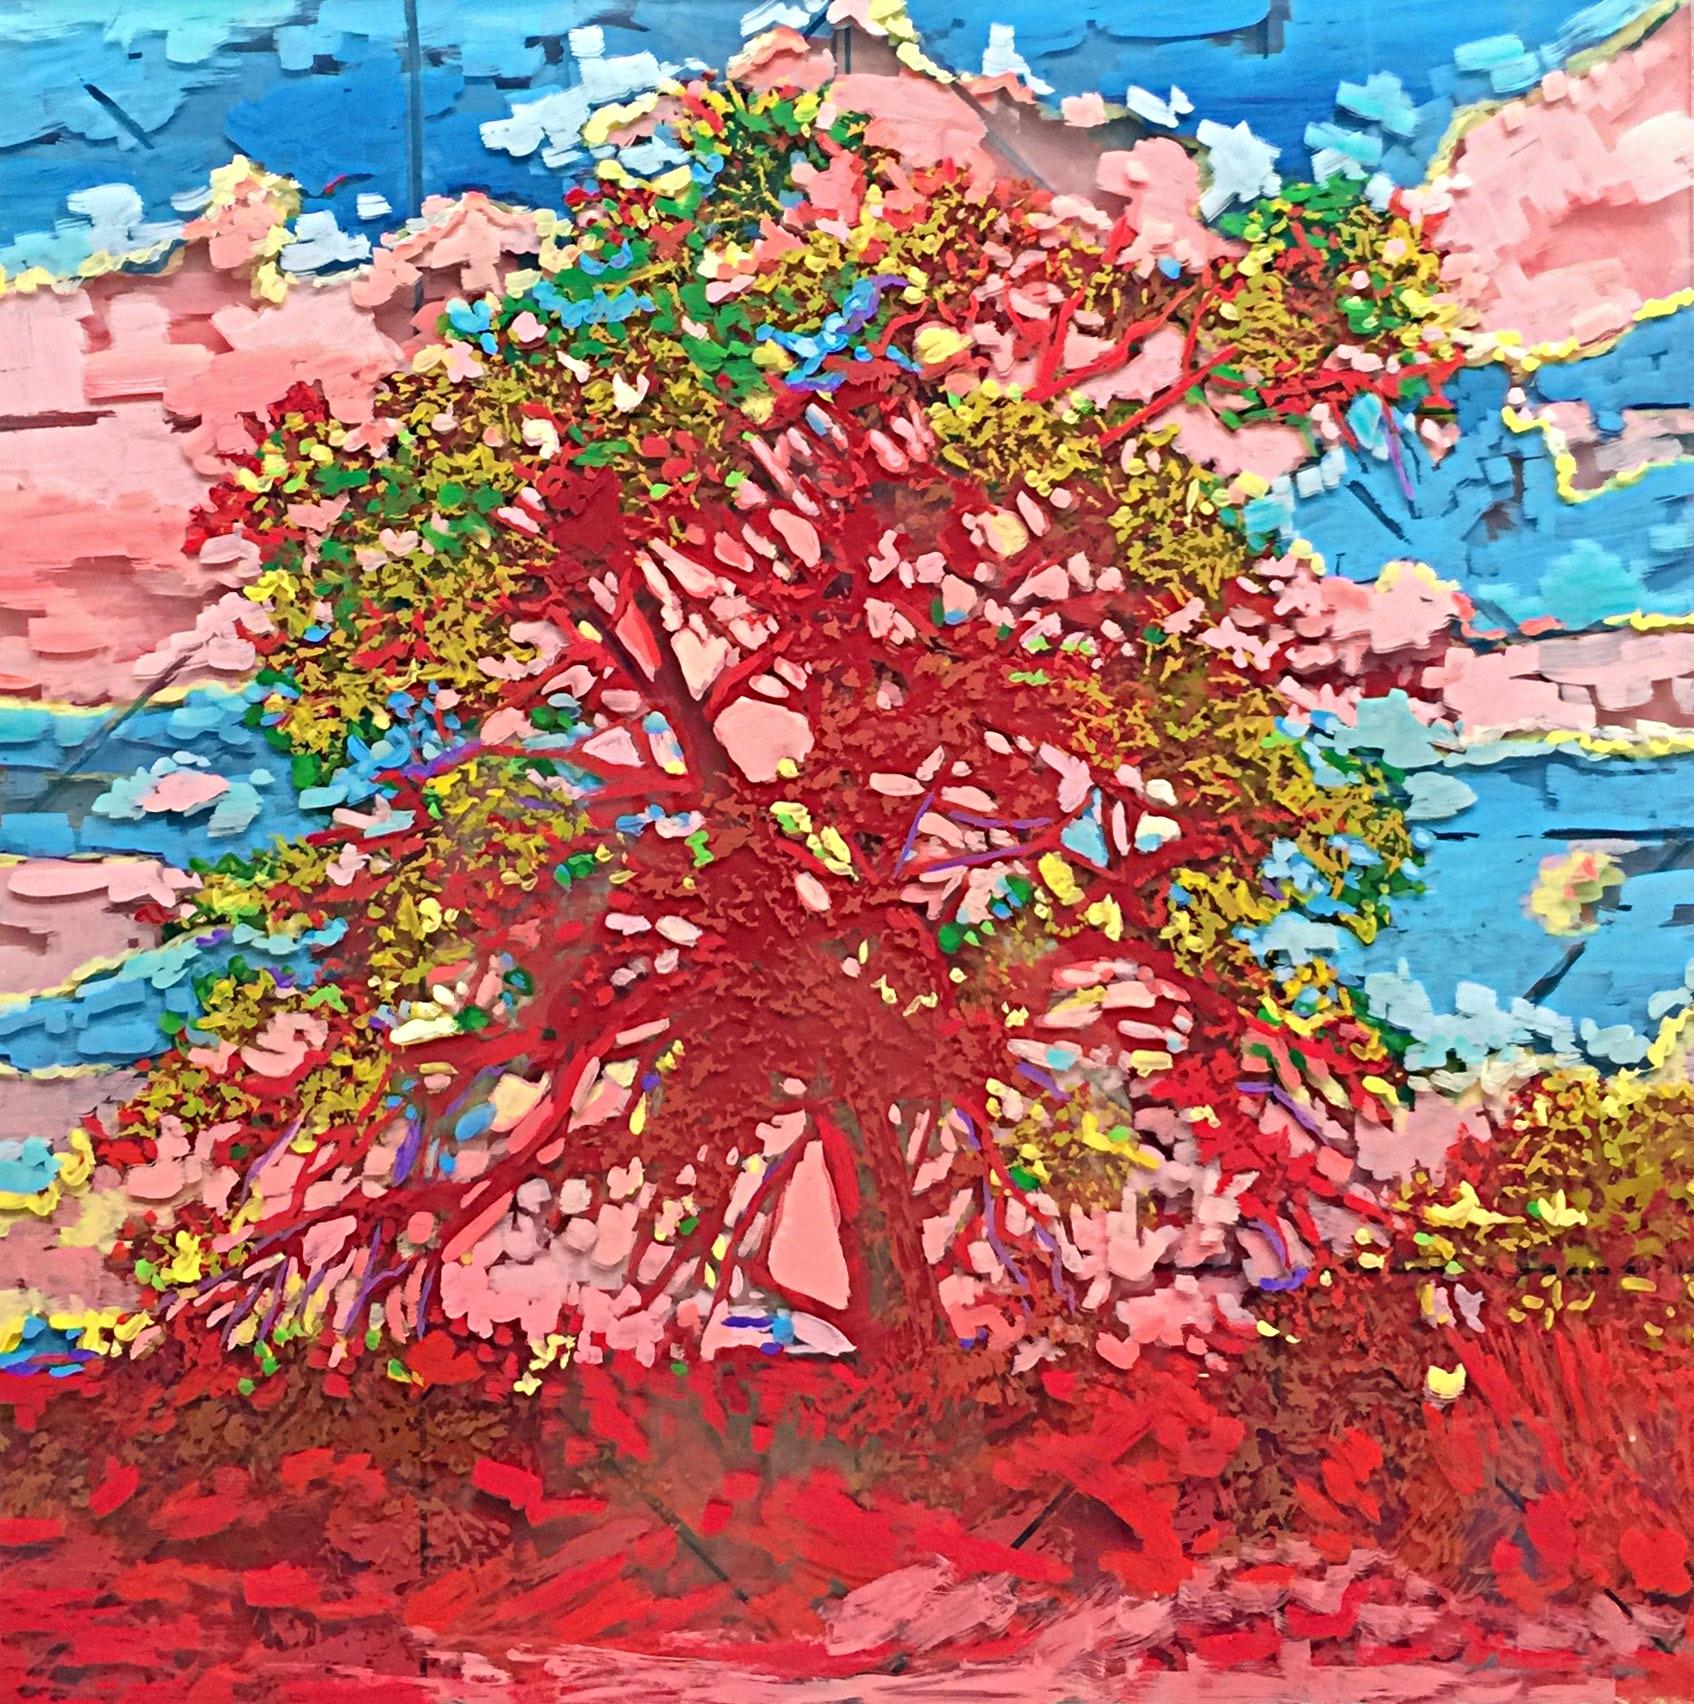 "Heart & Soul, 16"" x 16"" Acrylic on Multi-Layered Acrylic Glass"